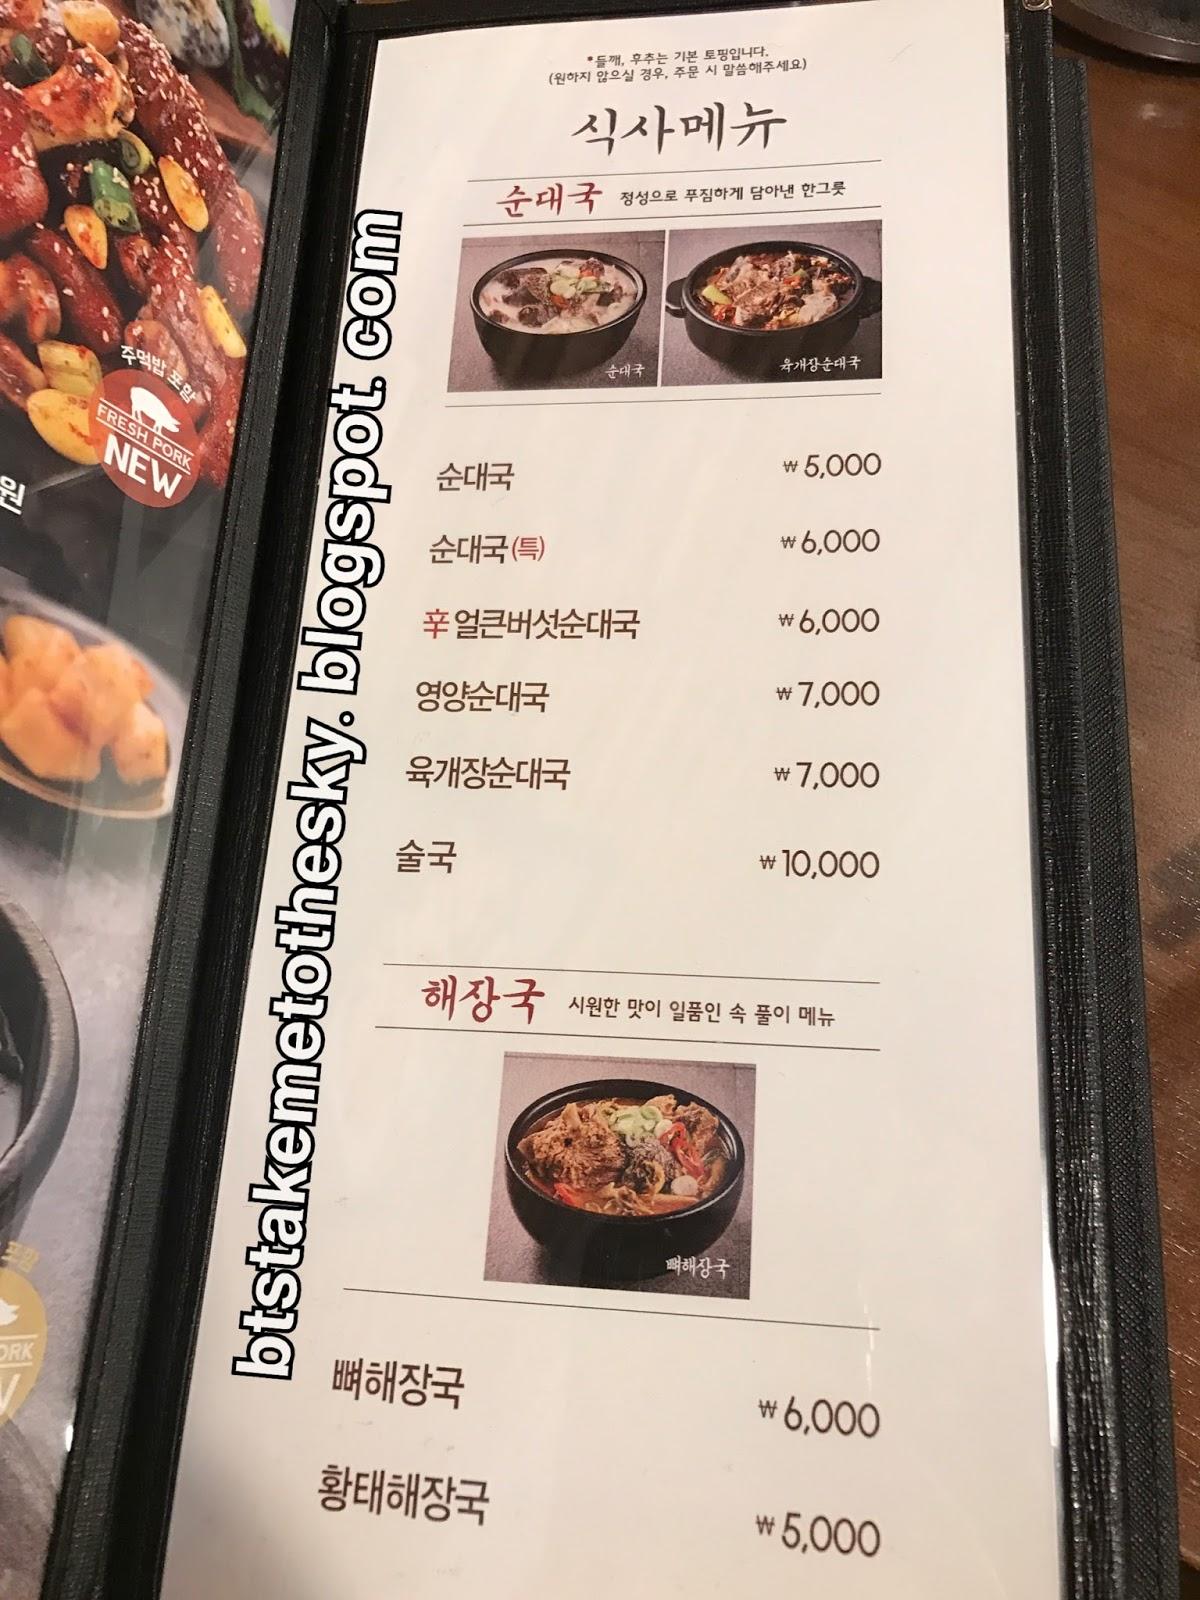 BTS SUGA\'s Mother\'s 큰맘할매순대국 Restaurant in Daegu Review + How ...